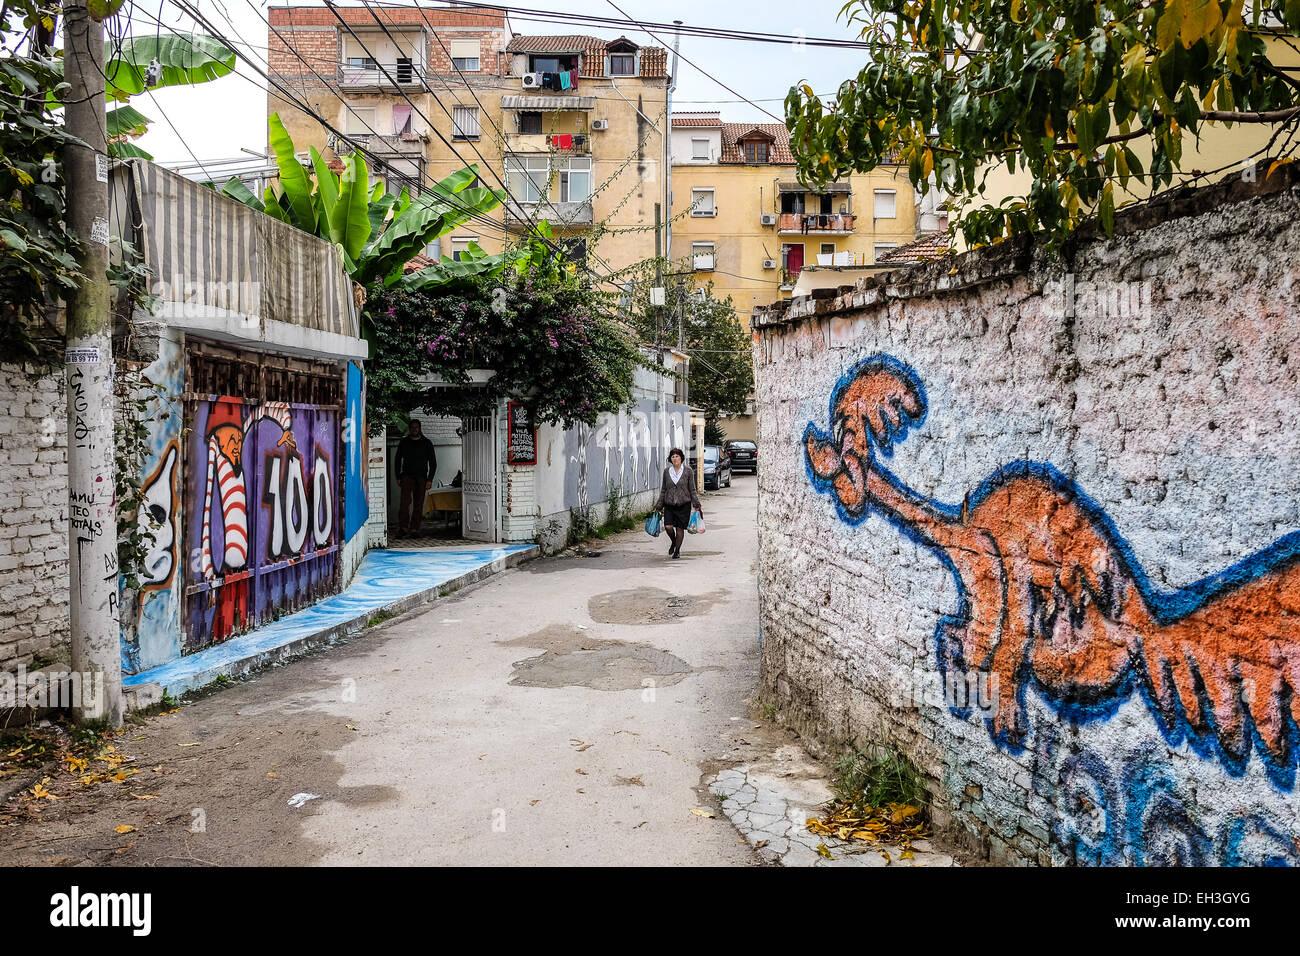 Albania, Tirana, graffiti - Stock Image